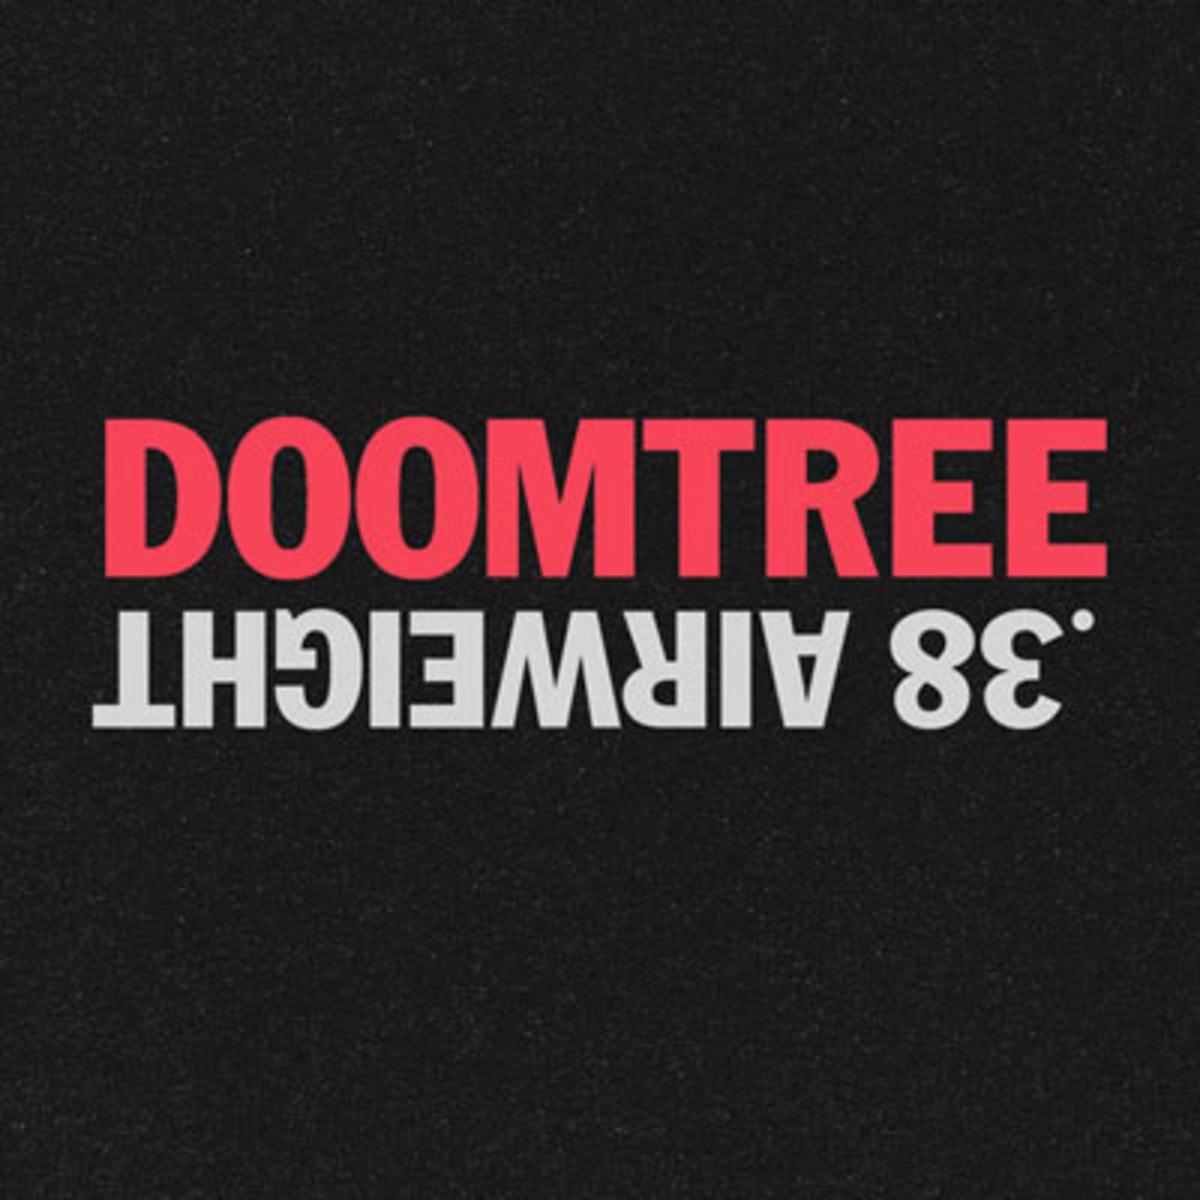 doomtree-38airweight.jpg